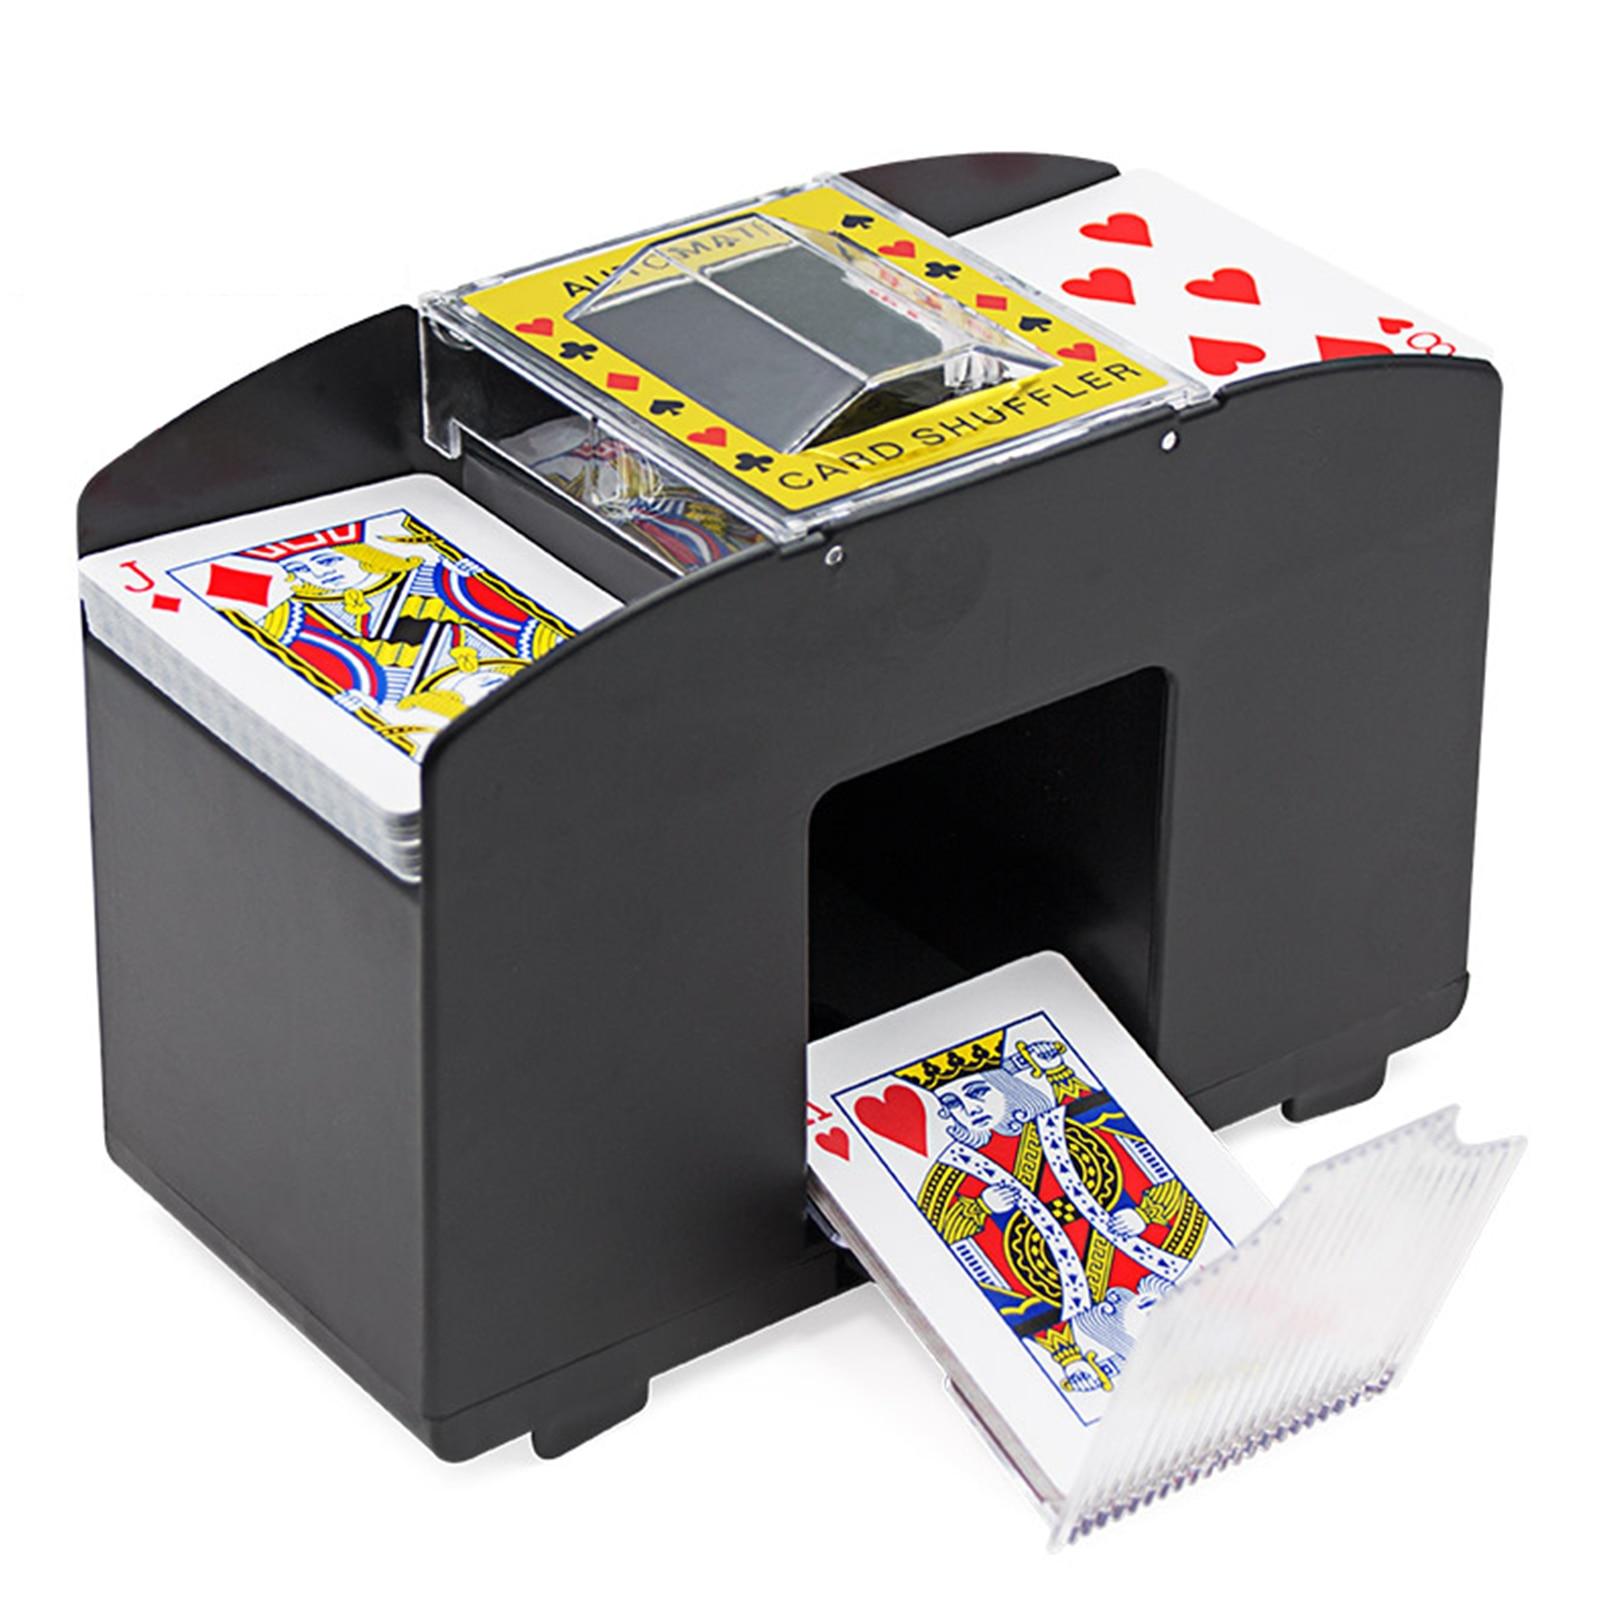 juego-de-cartas-de-poquer-electrico-automatico-poker-shuffler-robot-para-casino-tarjeta-mezclador-maquina-de-barajado-jugando-a-poker-herramienta